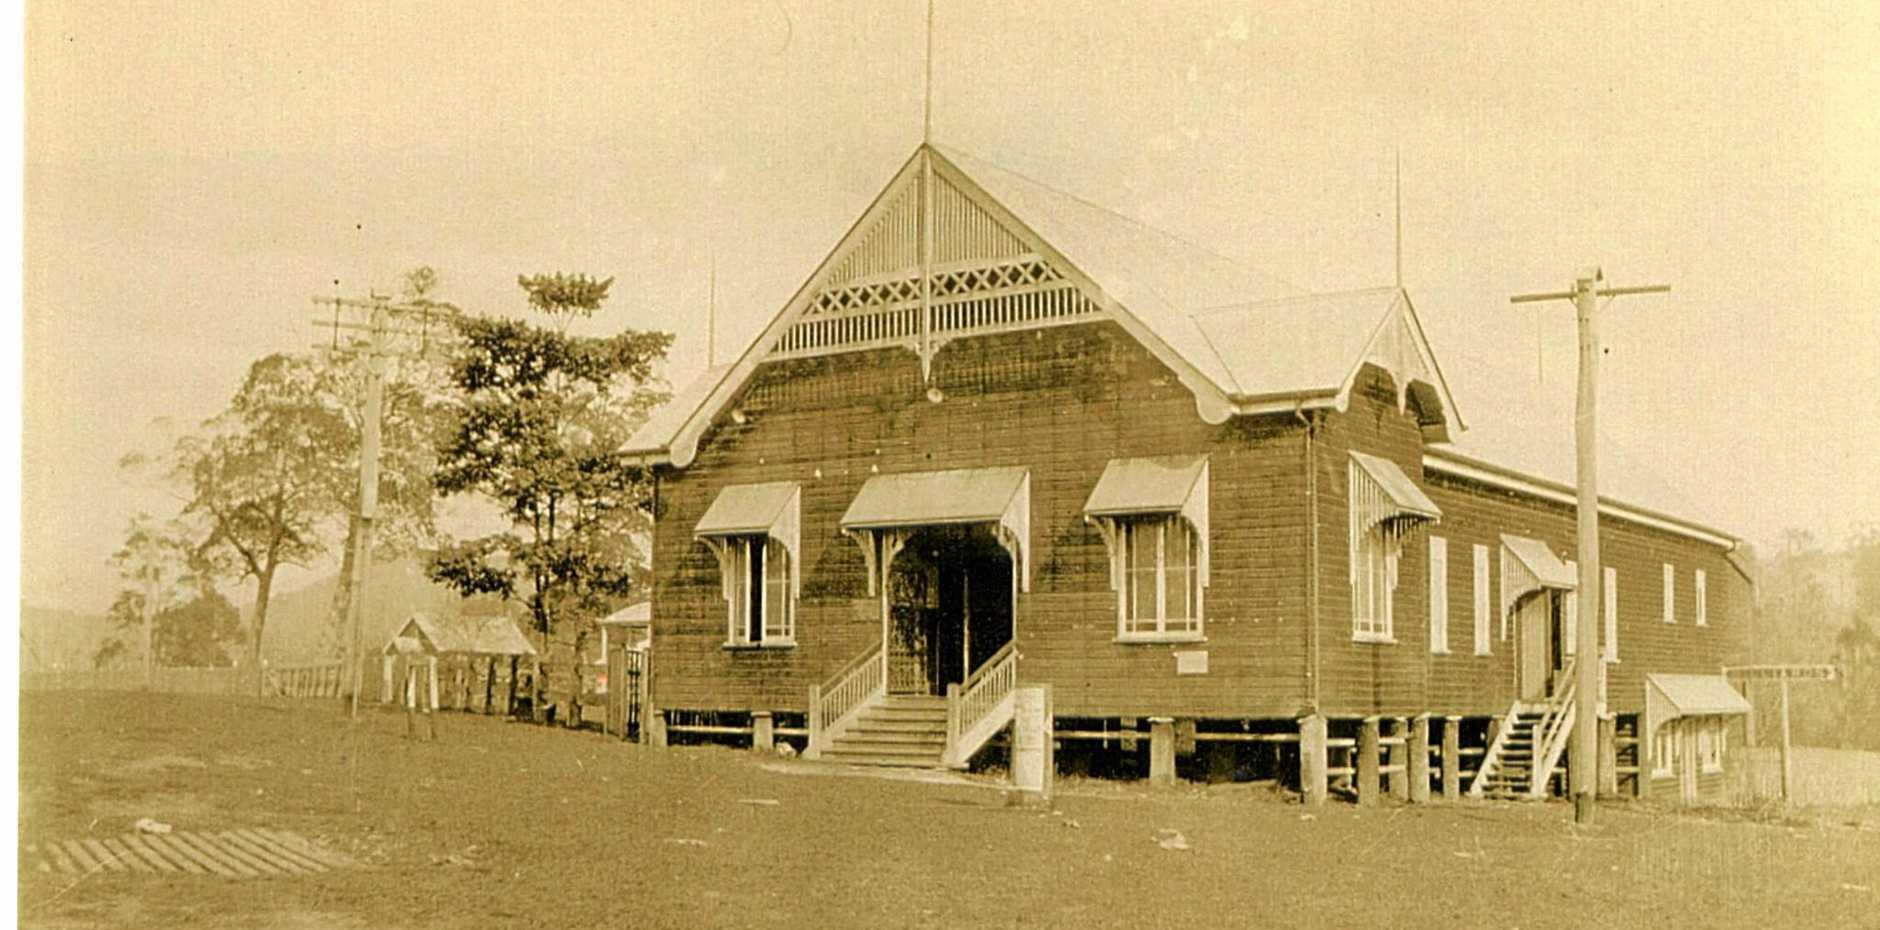 Yandina School of Arts in the early 1900s.